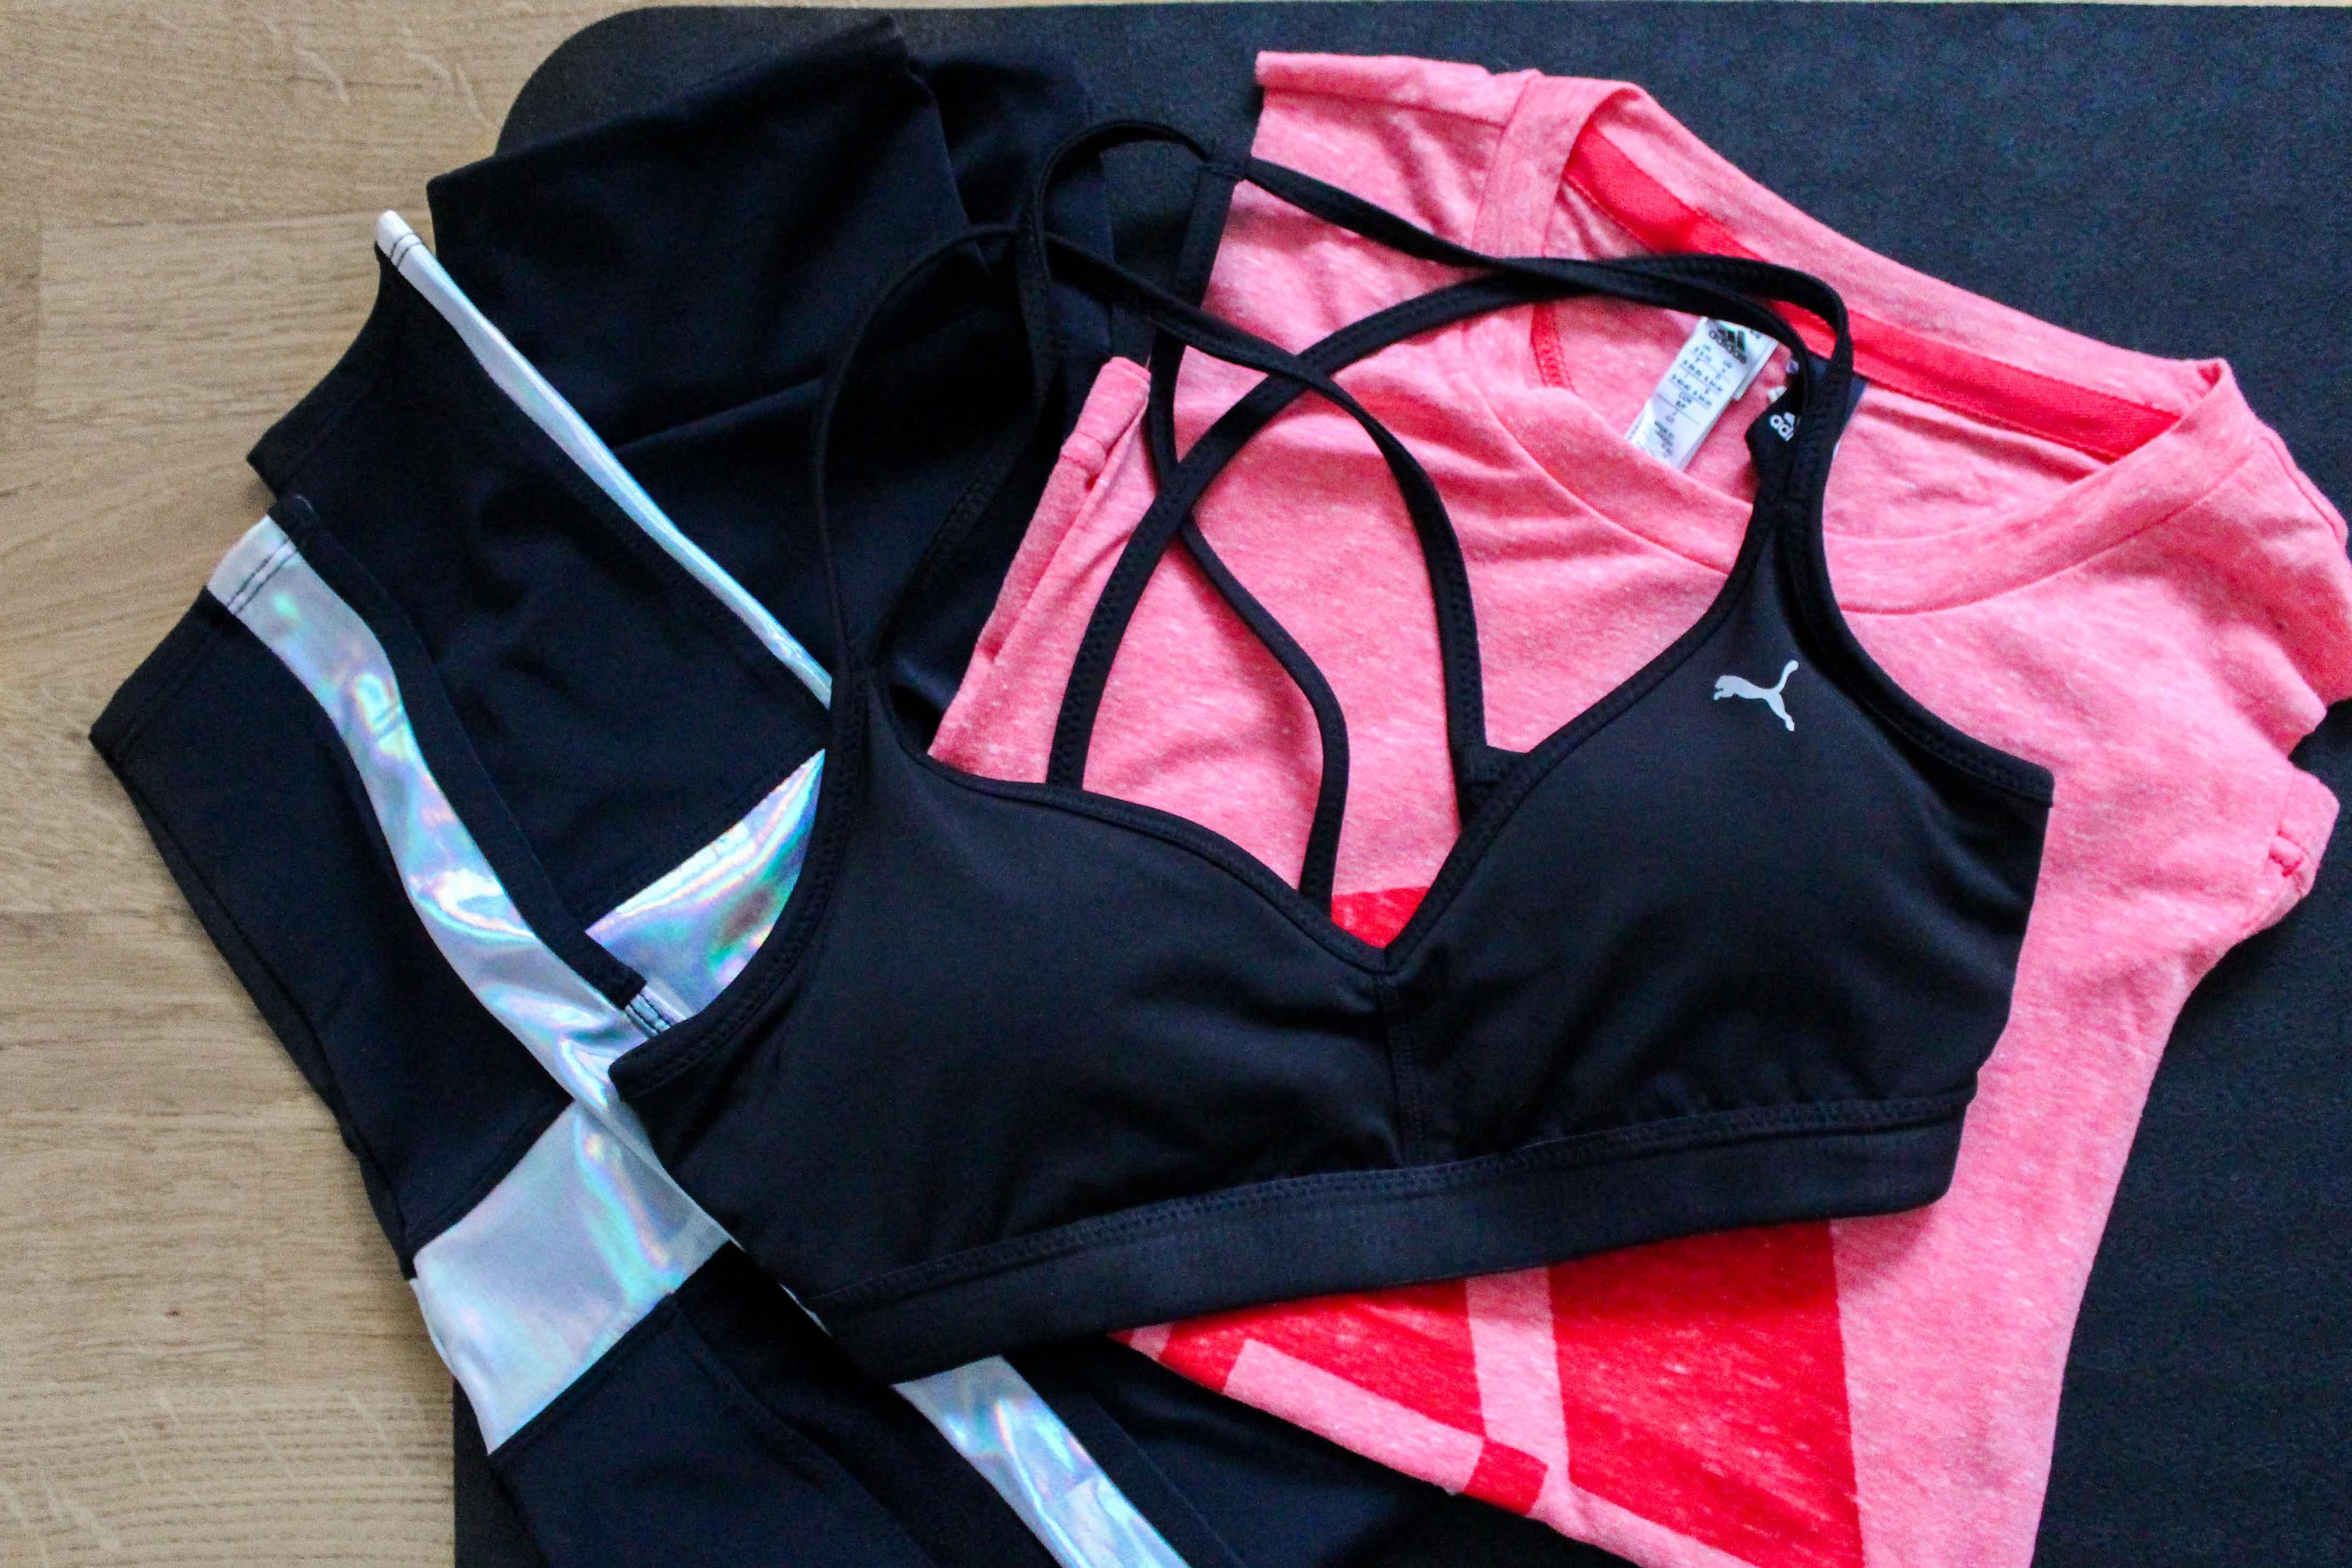 Yoga Outfit Zalando Ausstattung Adidas Sportoutfit Sporttrend Blogger